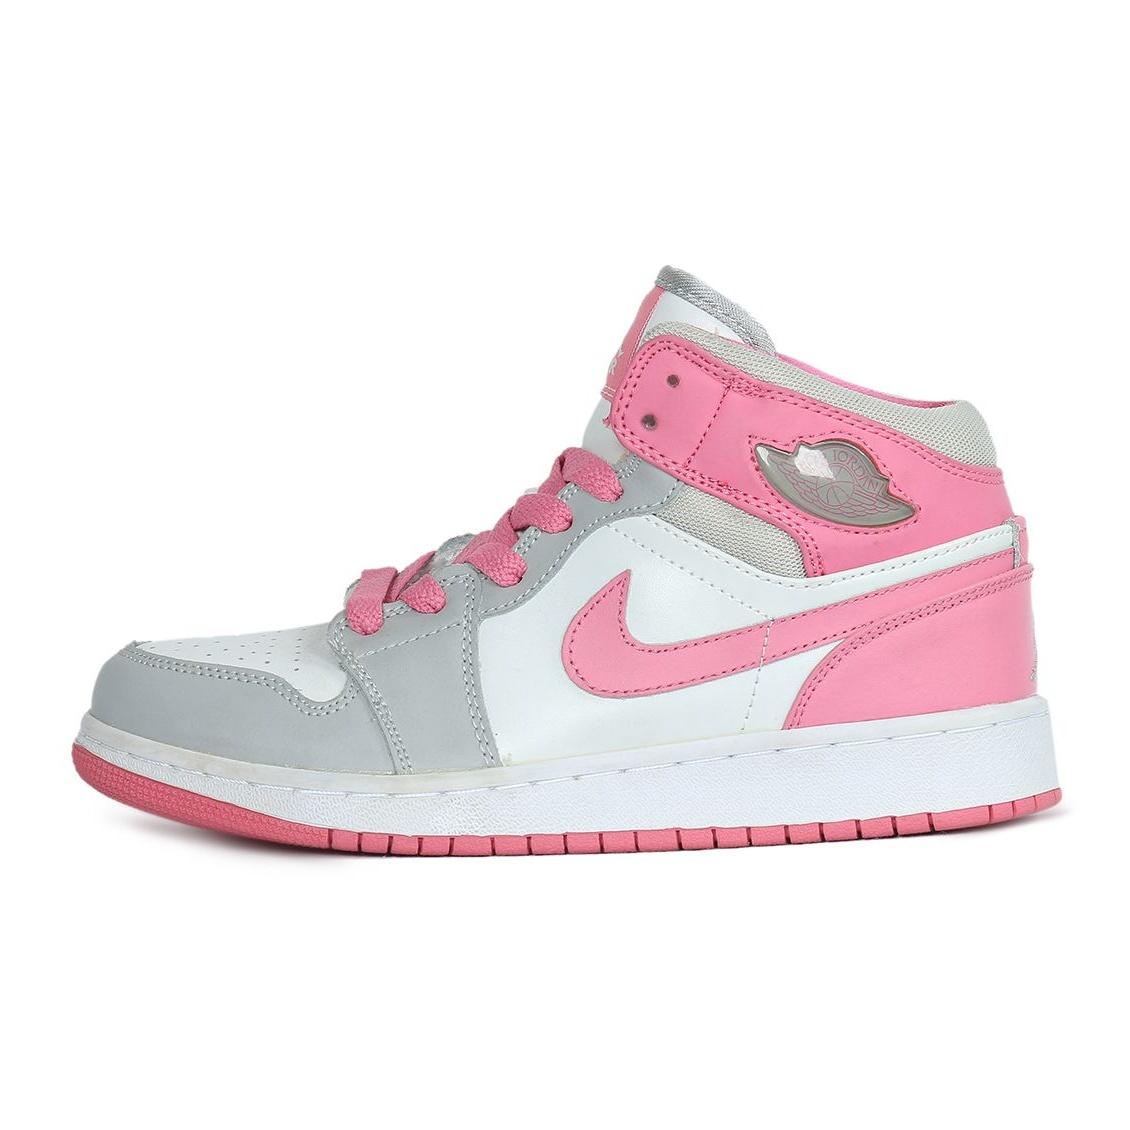 کفش راحتی نه نایکی مدل air jordan کد 109-555112